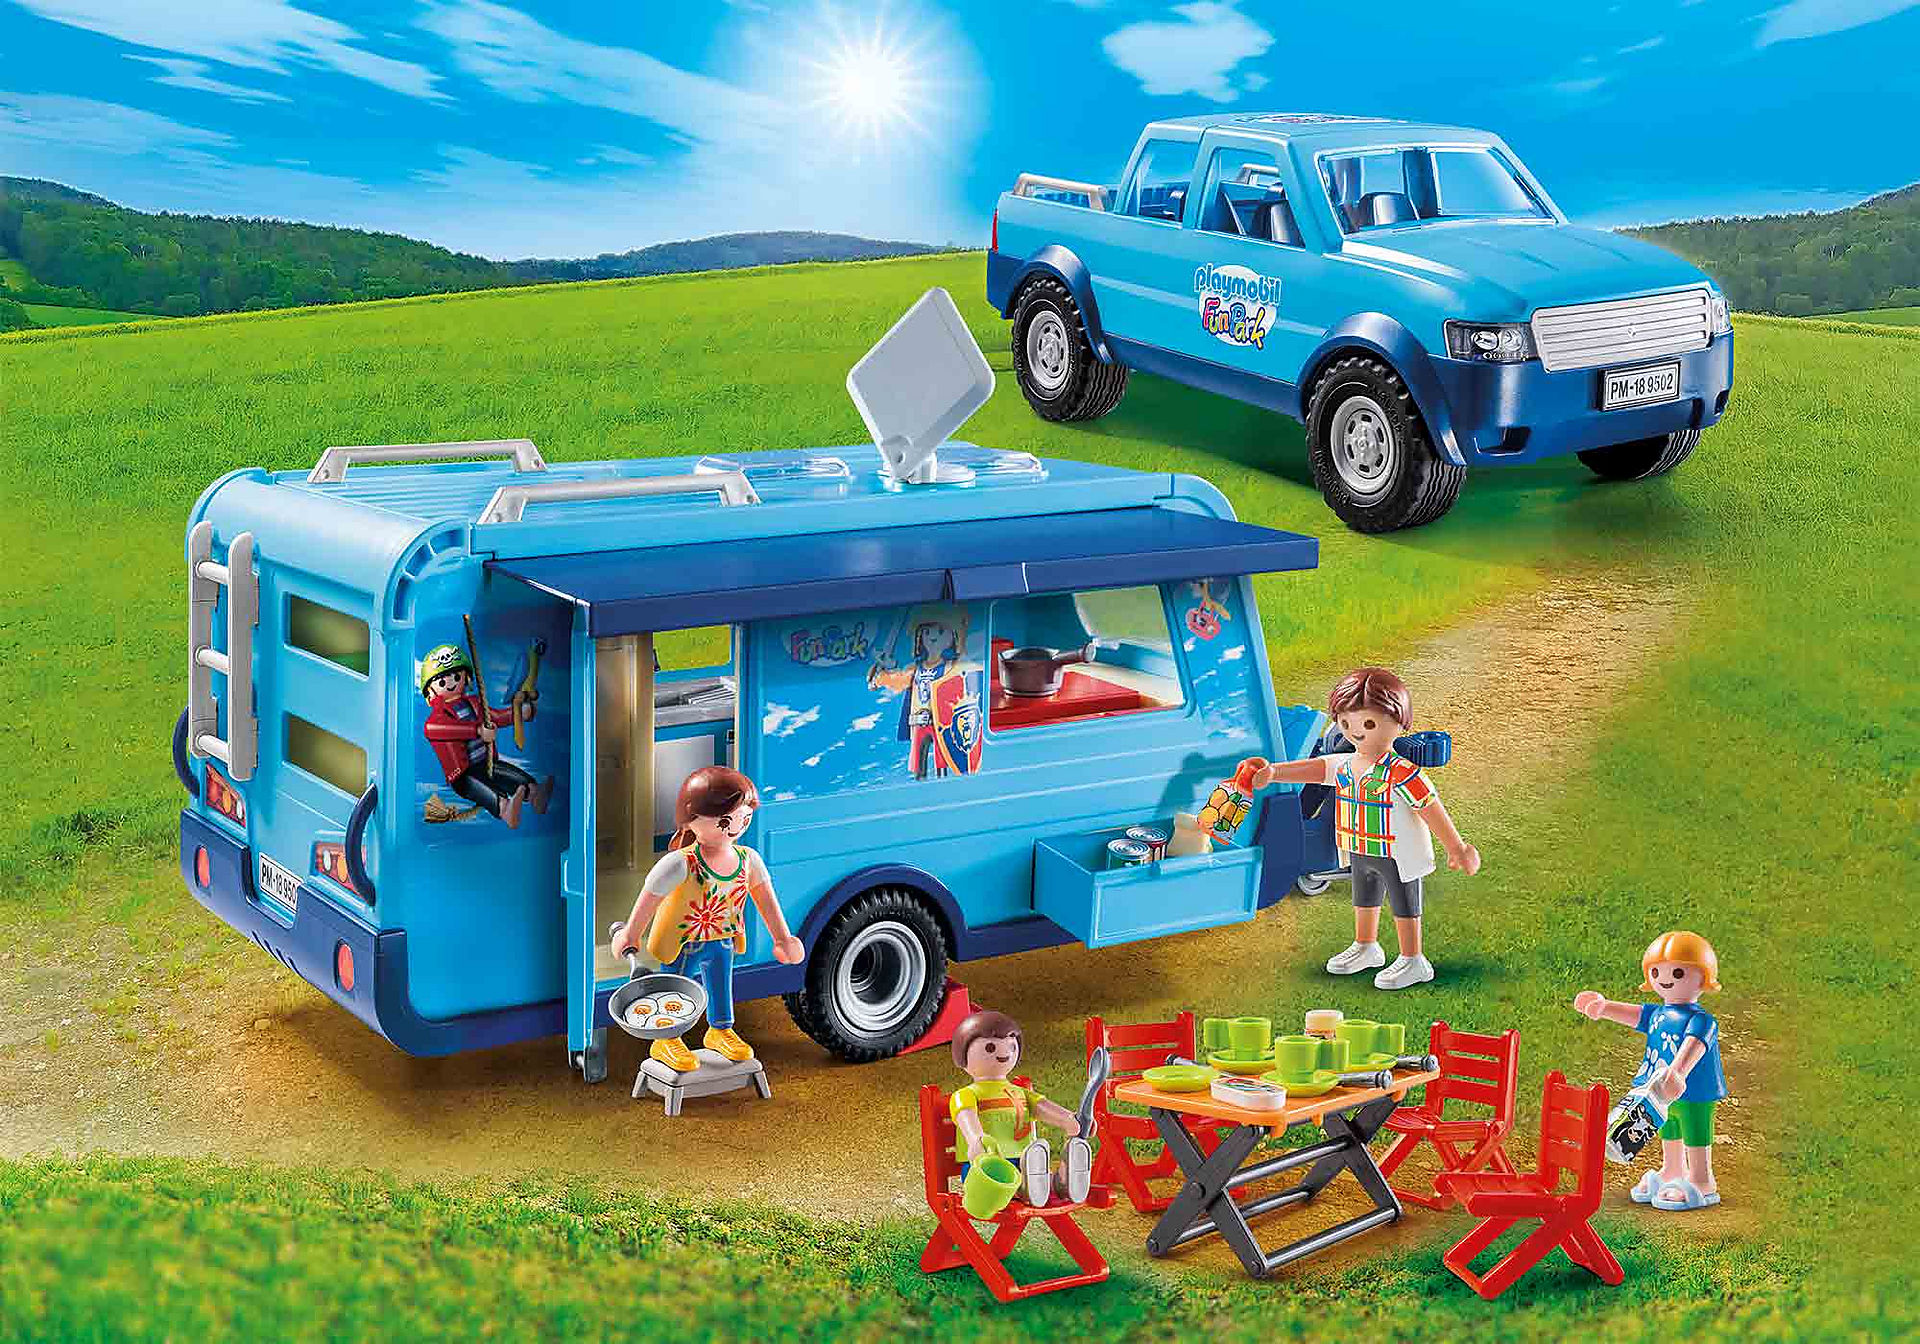 9502 PLAYMOBIL-FunPark Pick-Up mit Wohnwagen zoom image1